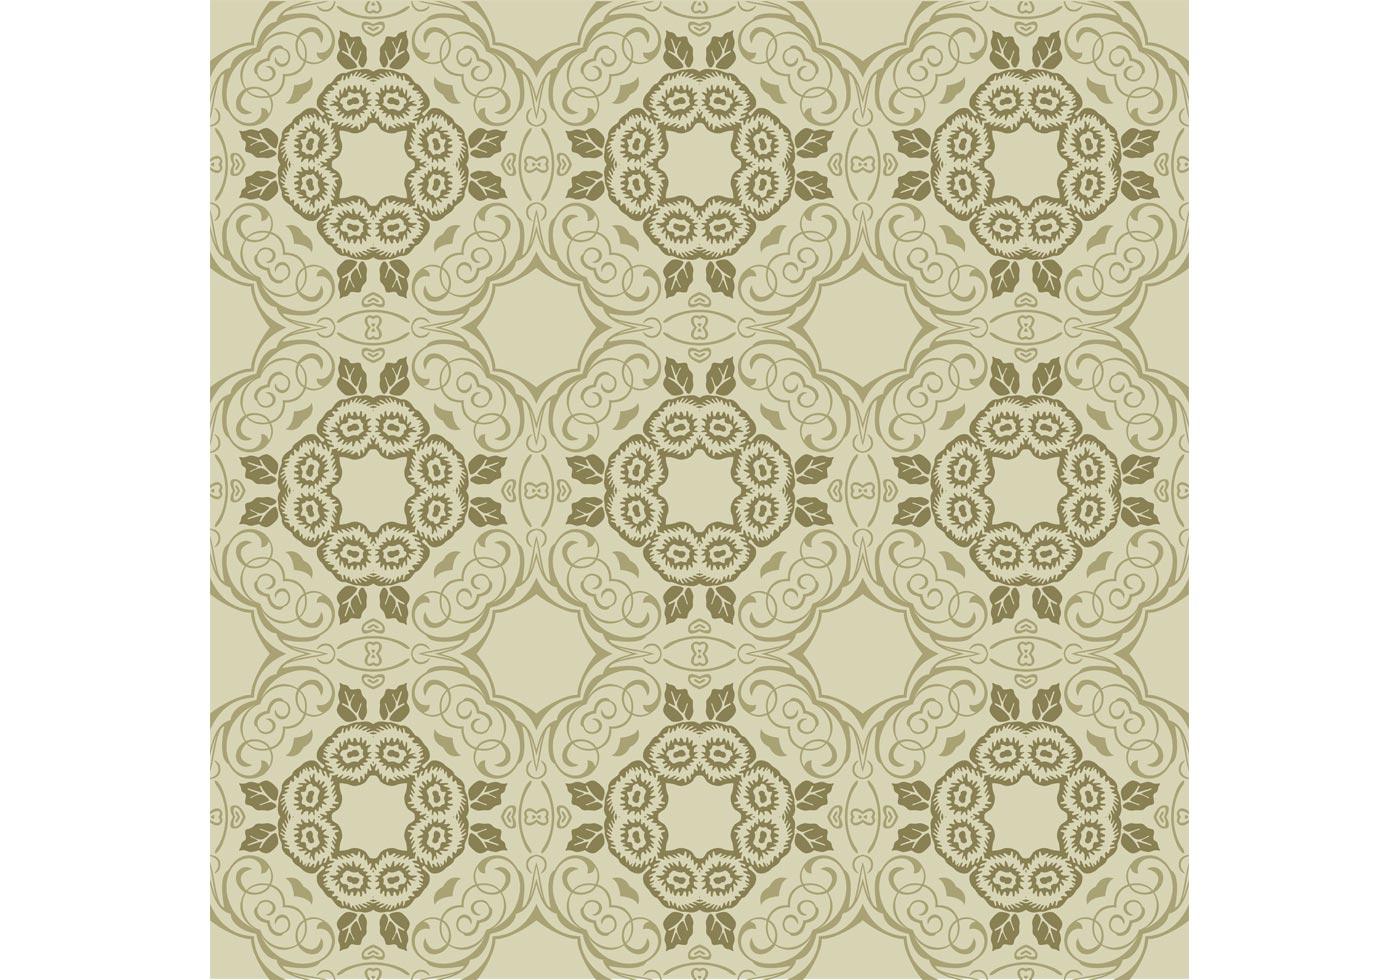 Green Floral Wallpaper